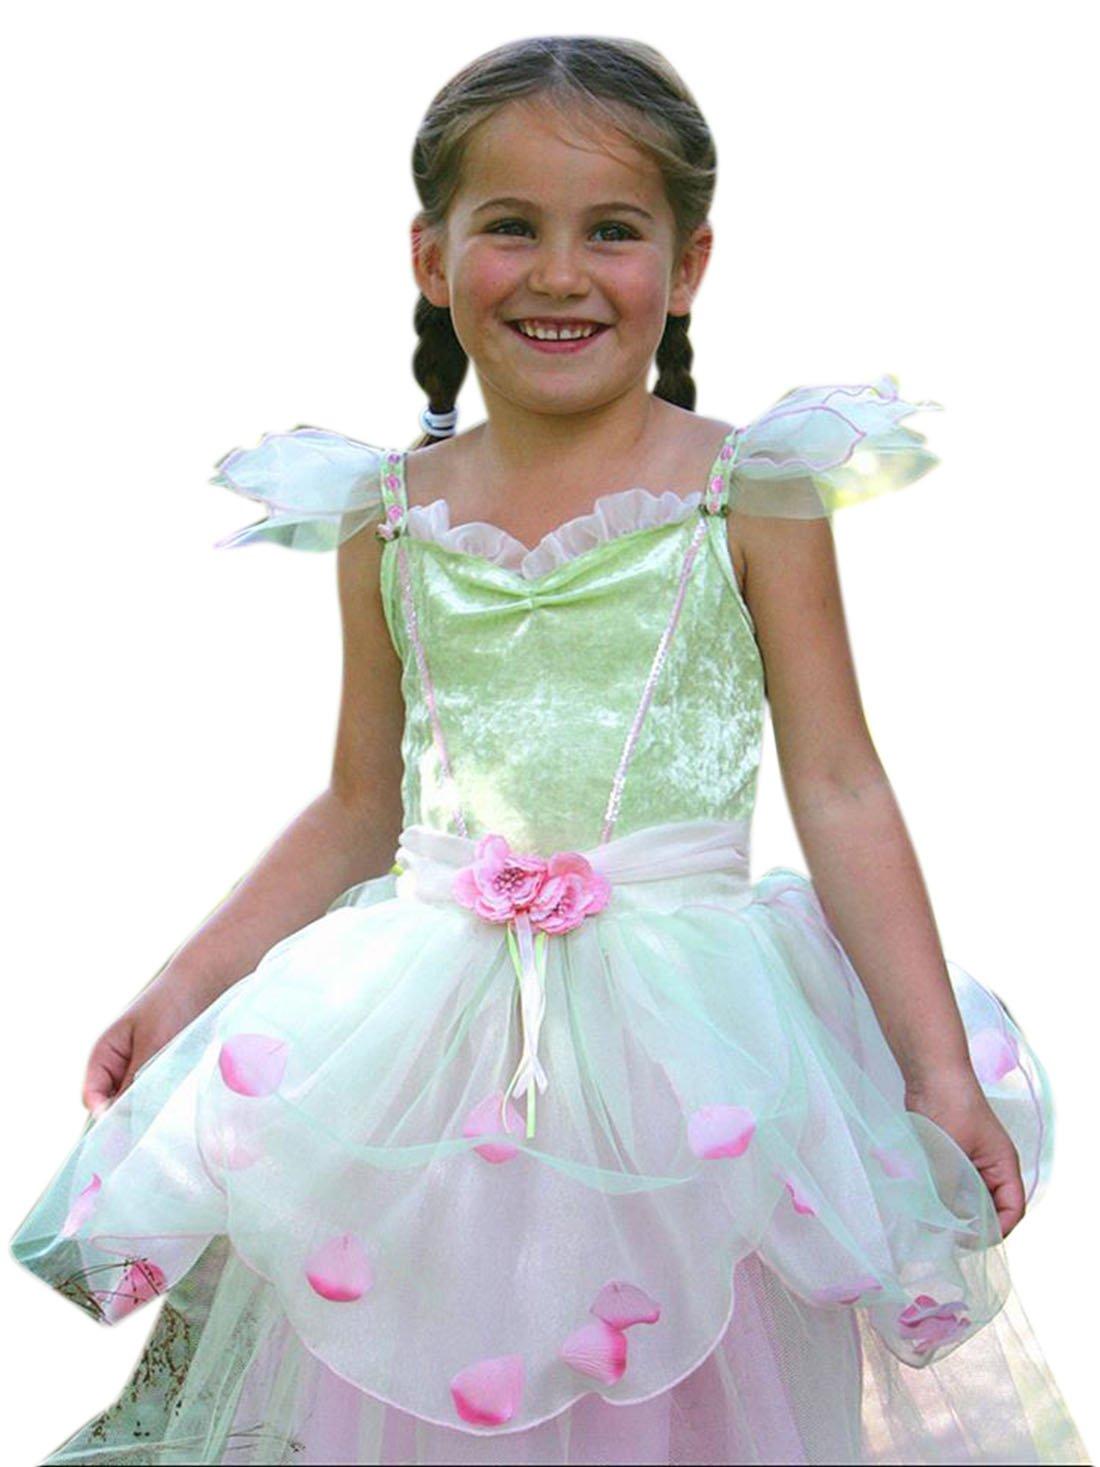 Confettery - Mädchen Karneval Kostüm Kleid Apple Blossom, Mehrfarbig, Größe 98-110, 3-5 Jahre